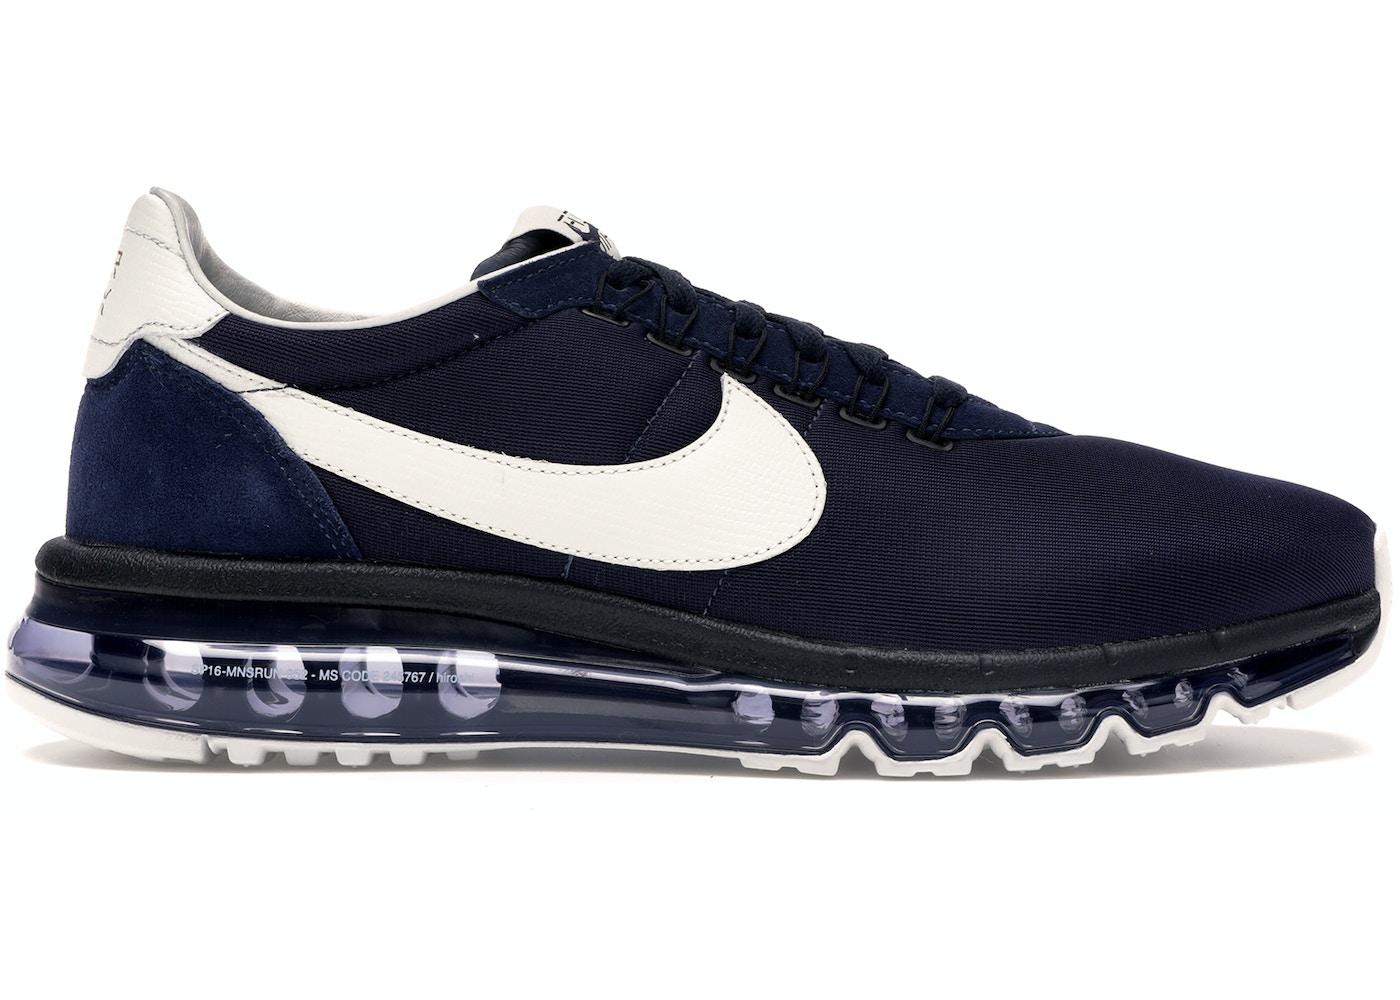 Madison Teseo Delegar  Nike Air Max LD Zero Hiroshi Fujiwara - 848624-410